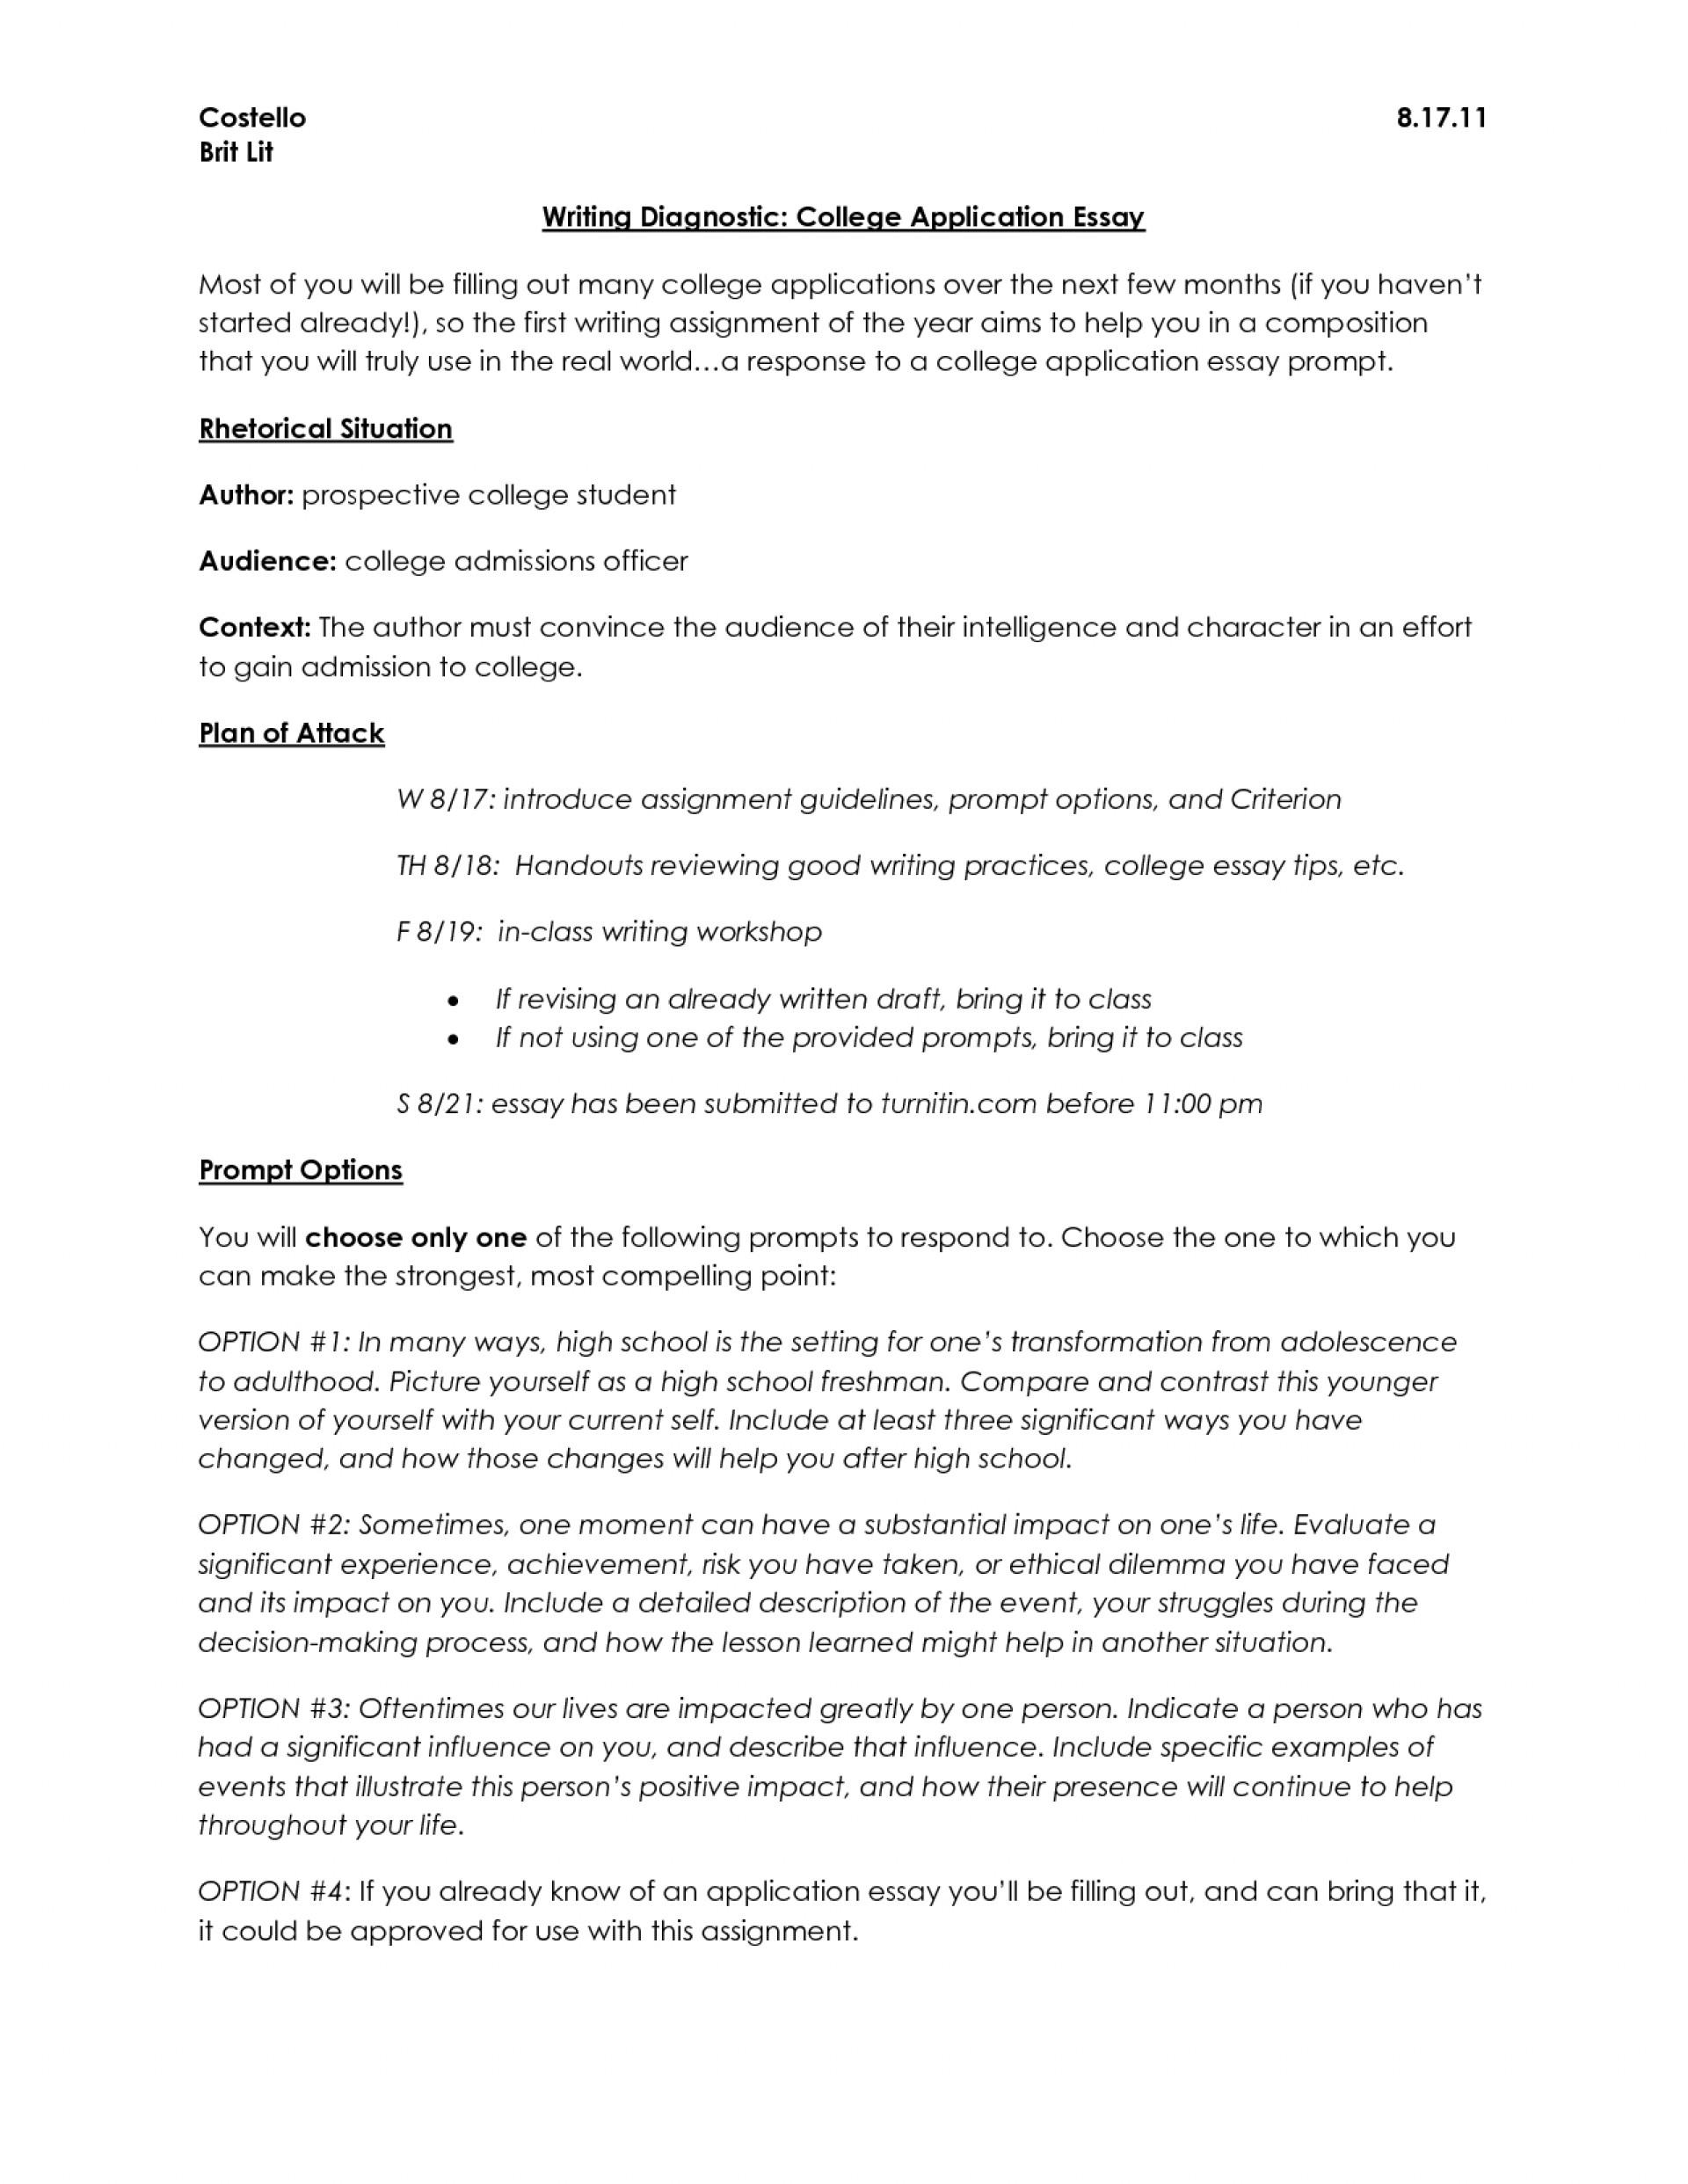 002 uf application essay example college examples printables corner